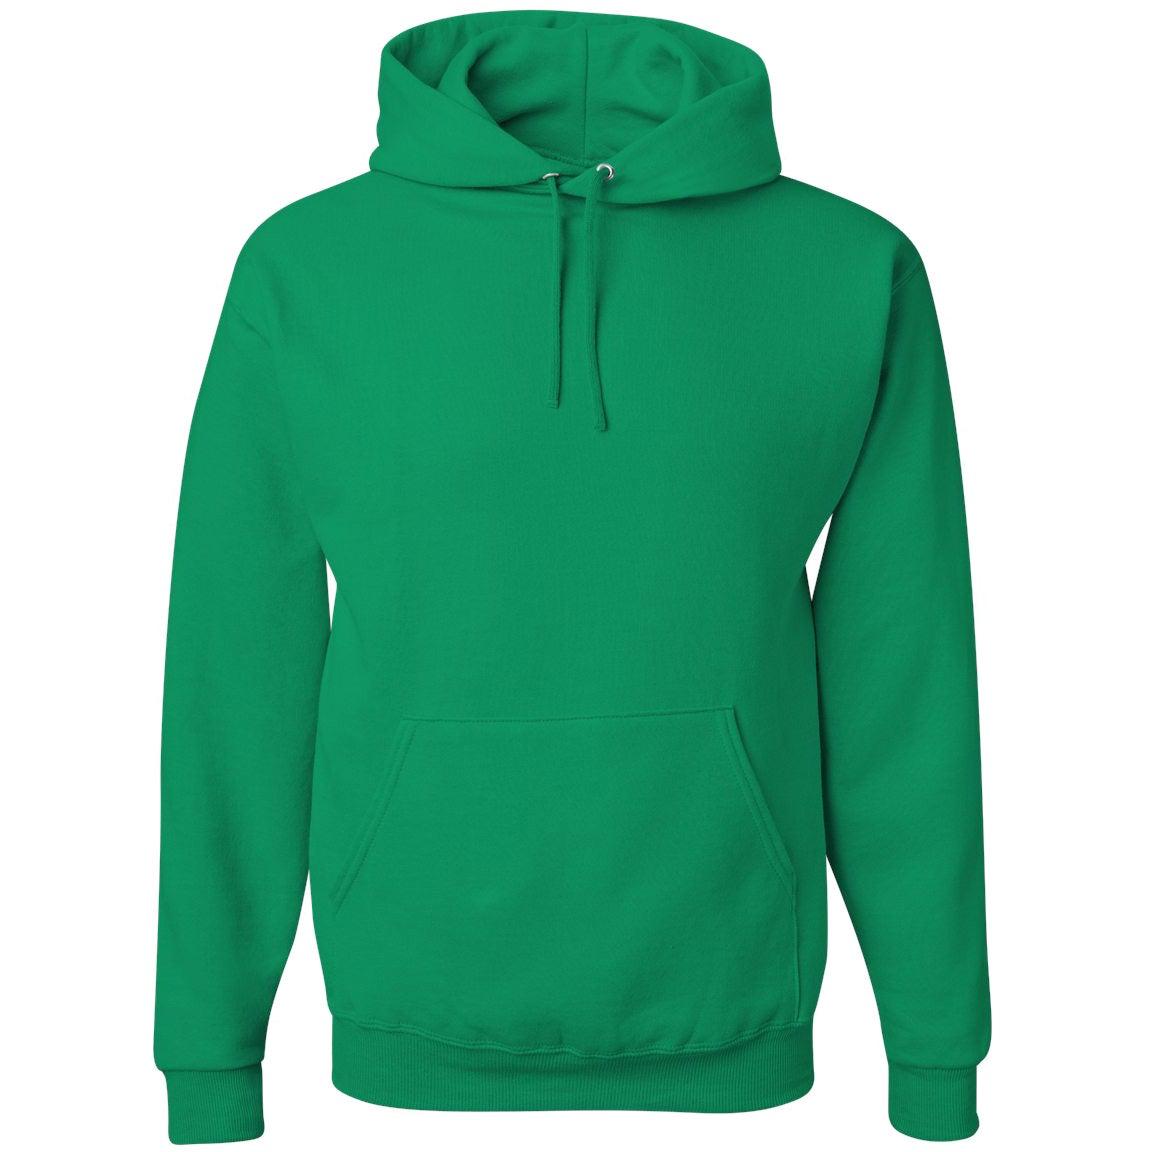 Jerzee hoodies